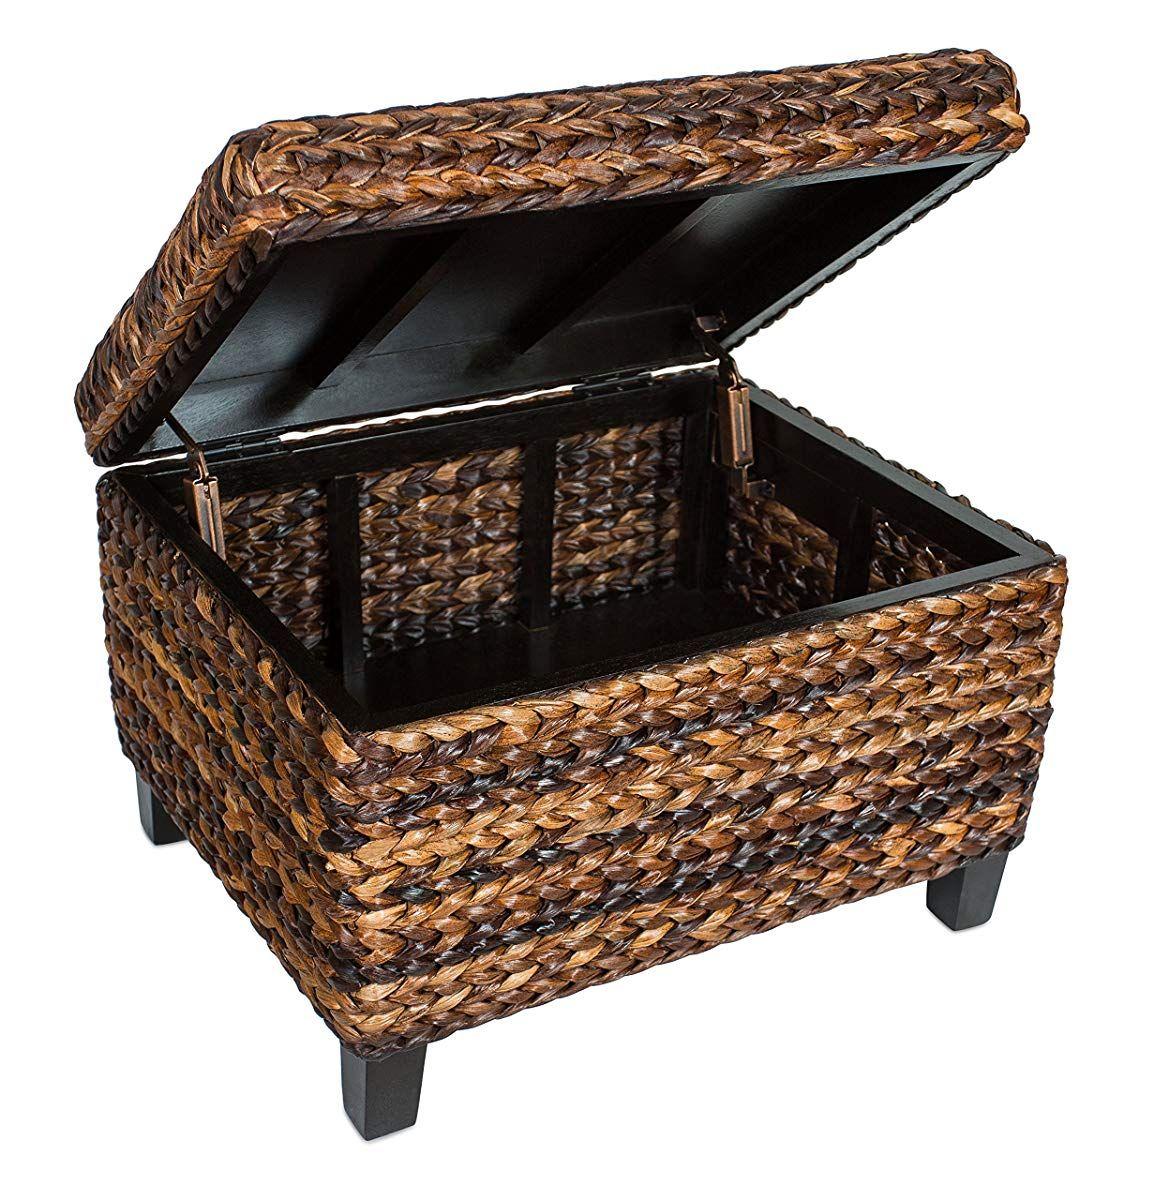 Rattan Coffee Table And Storage Ottoman Rustic Living Room